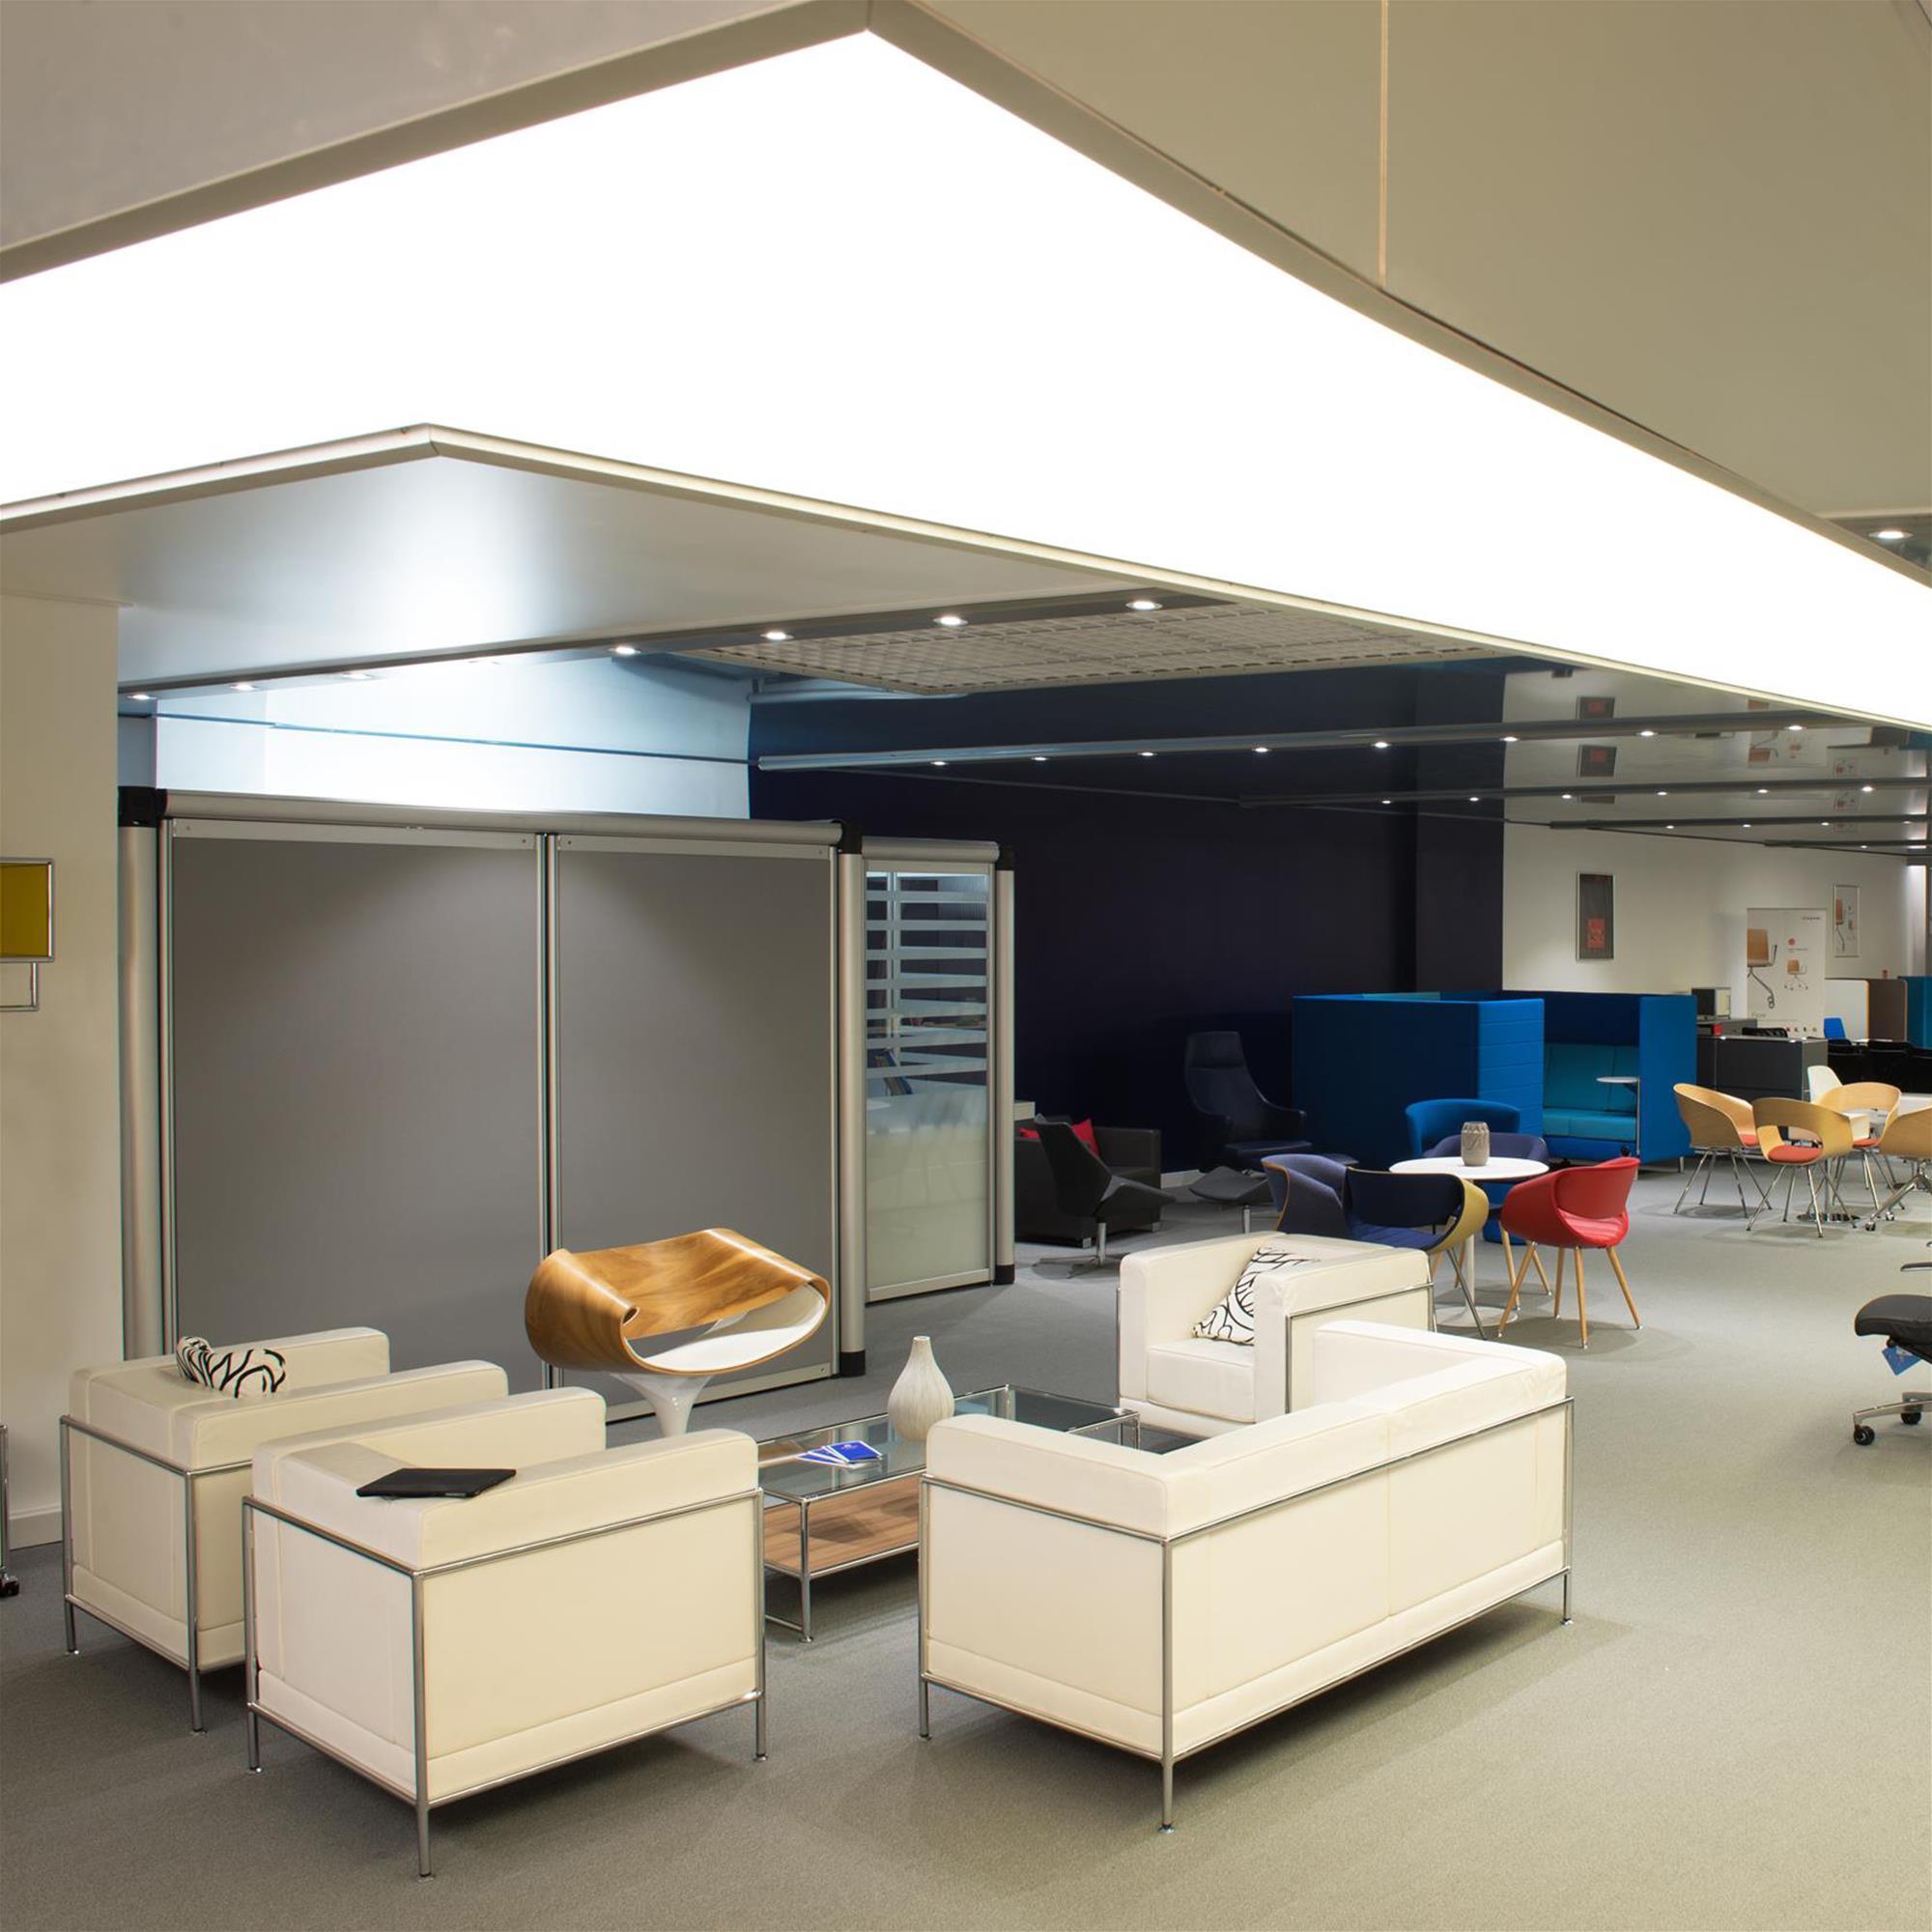 afcb professionnel d am nagement de bureau. Black Bedroom Furniture Sets. Home Design Ideas